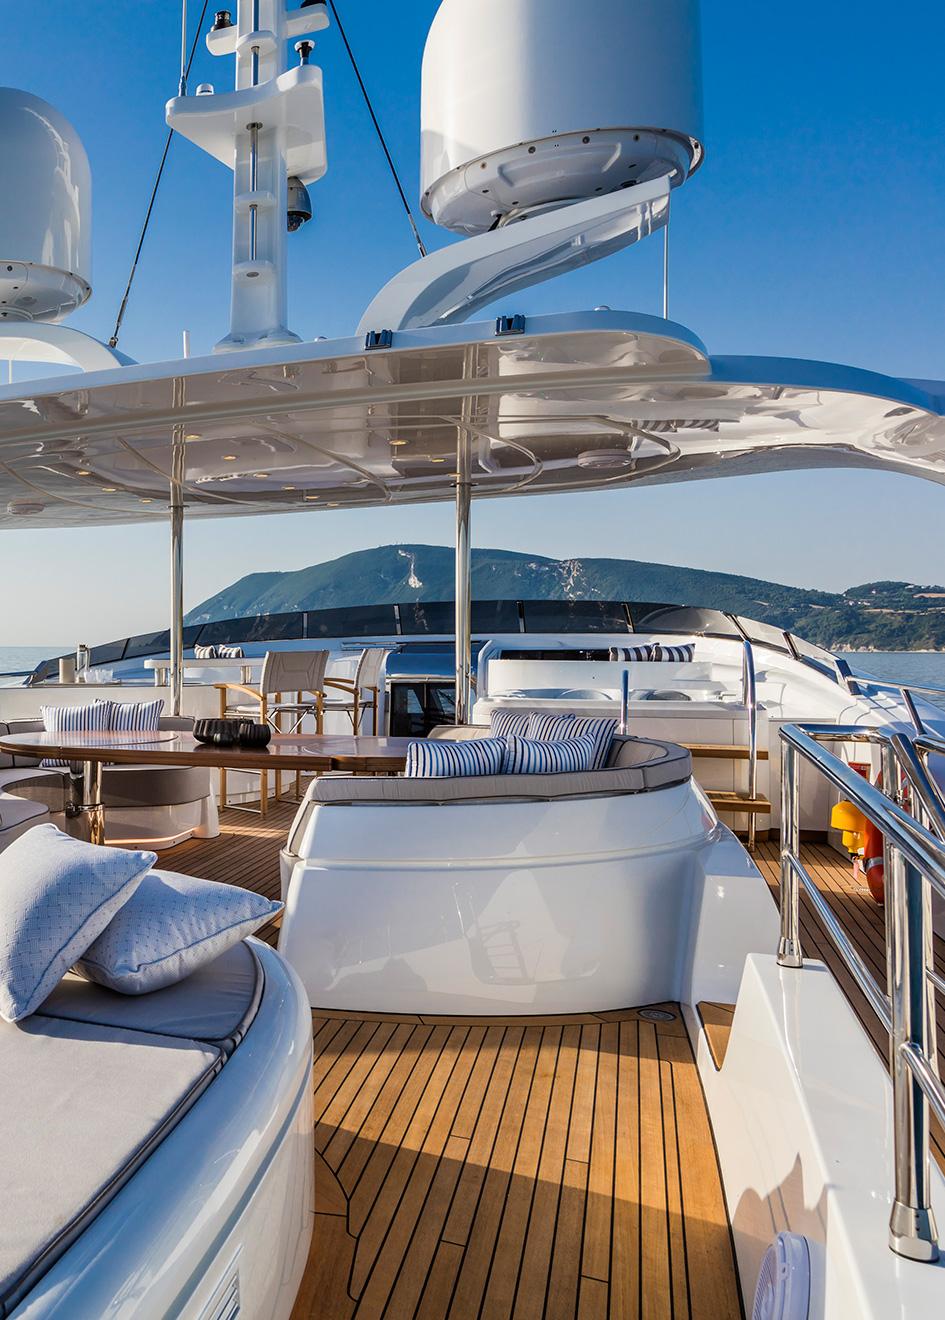 the-sundeck-of-the-isa-motor-yacht-clorinda